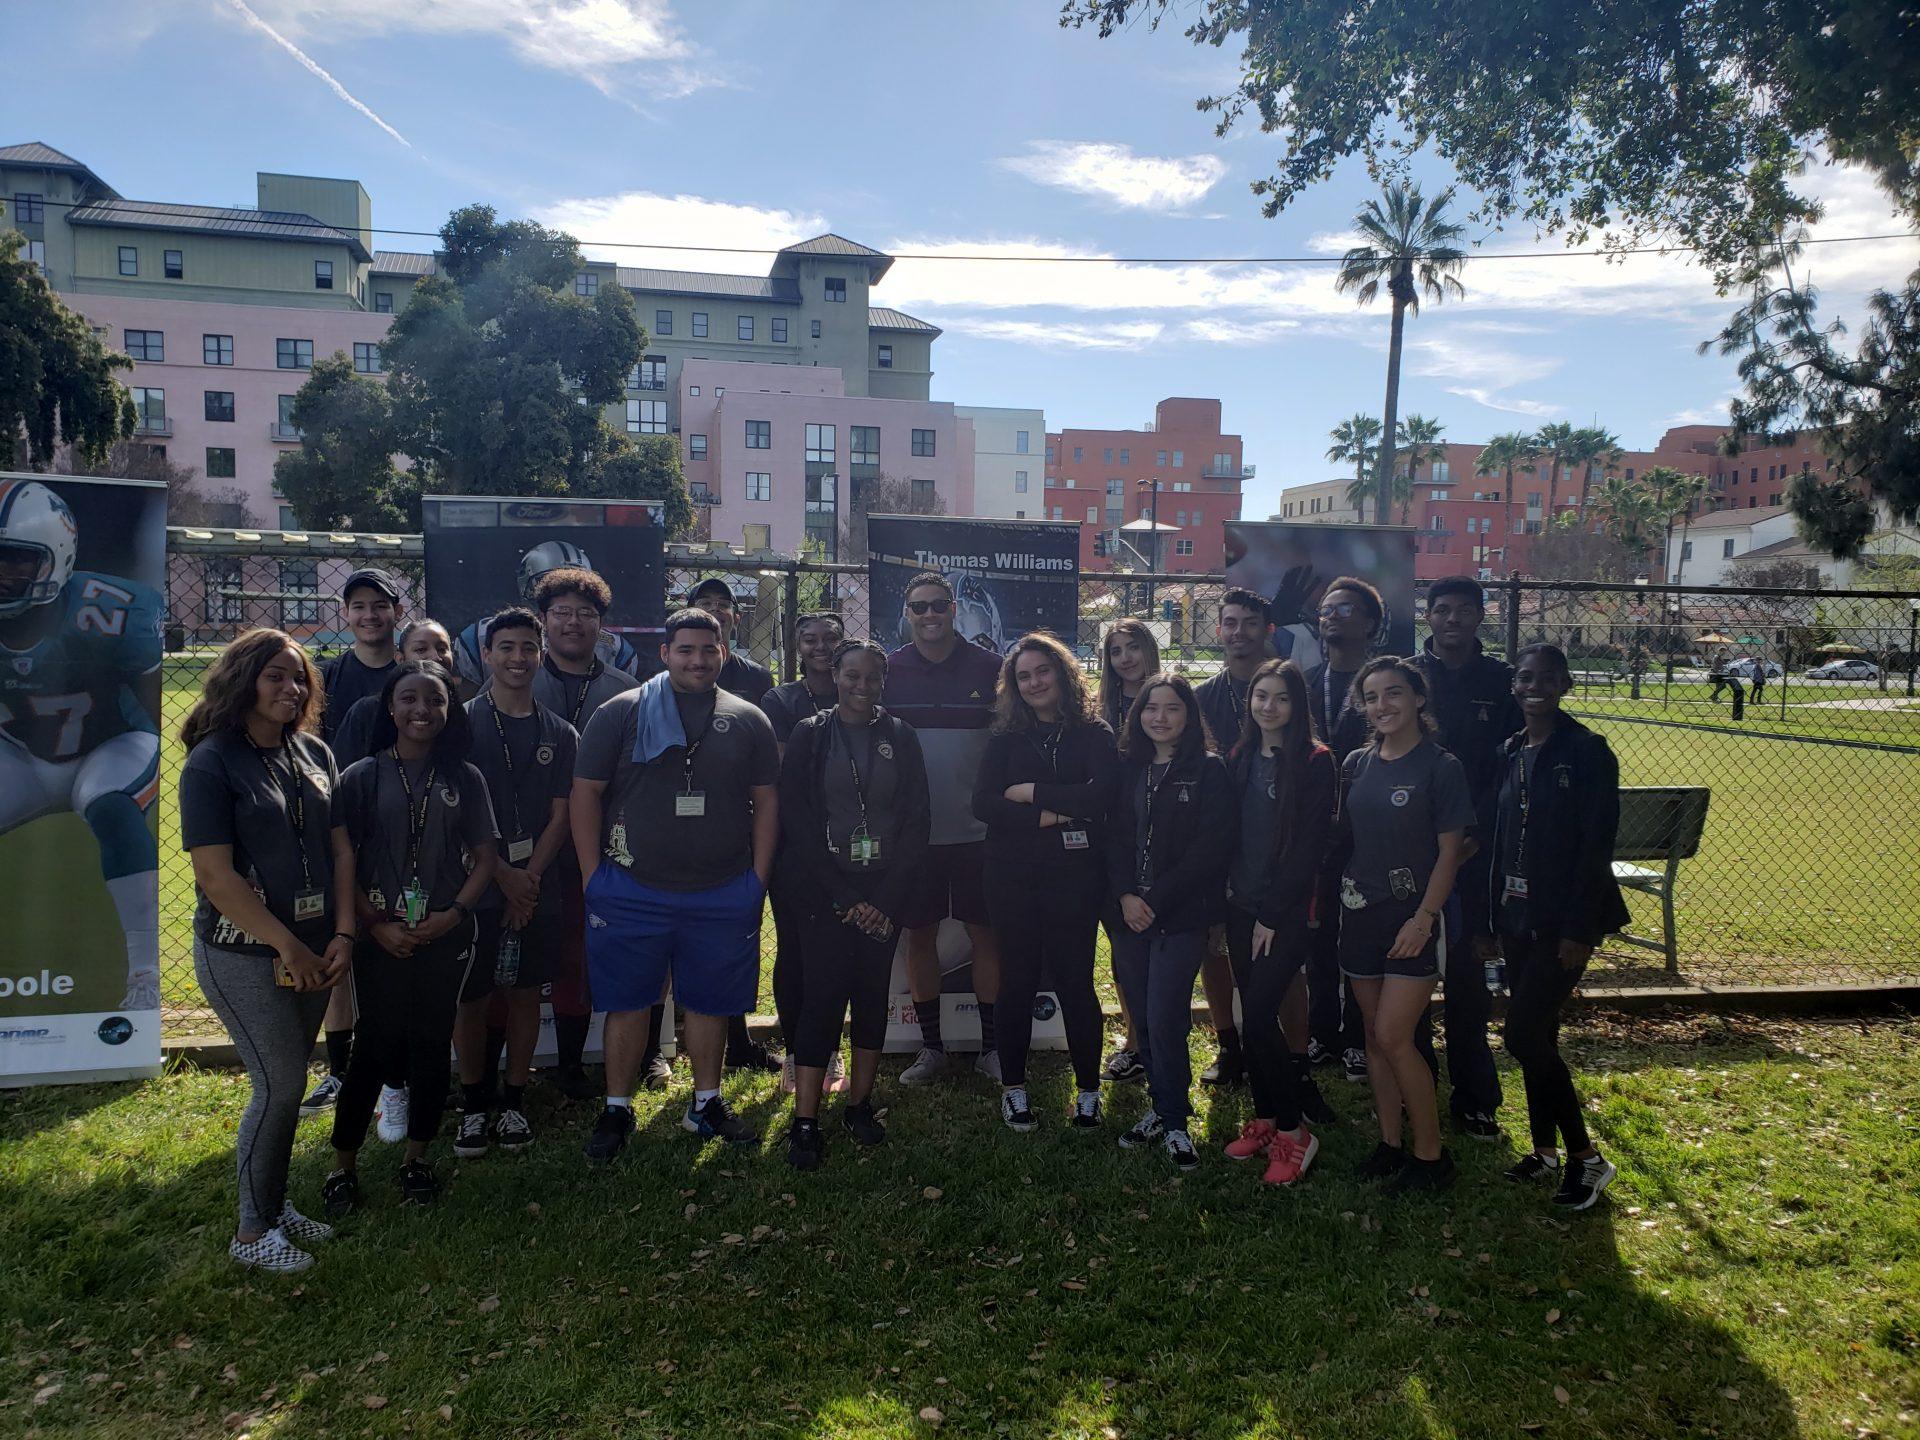 Youth Ambassadors with Thomas Williams